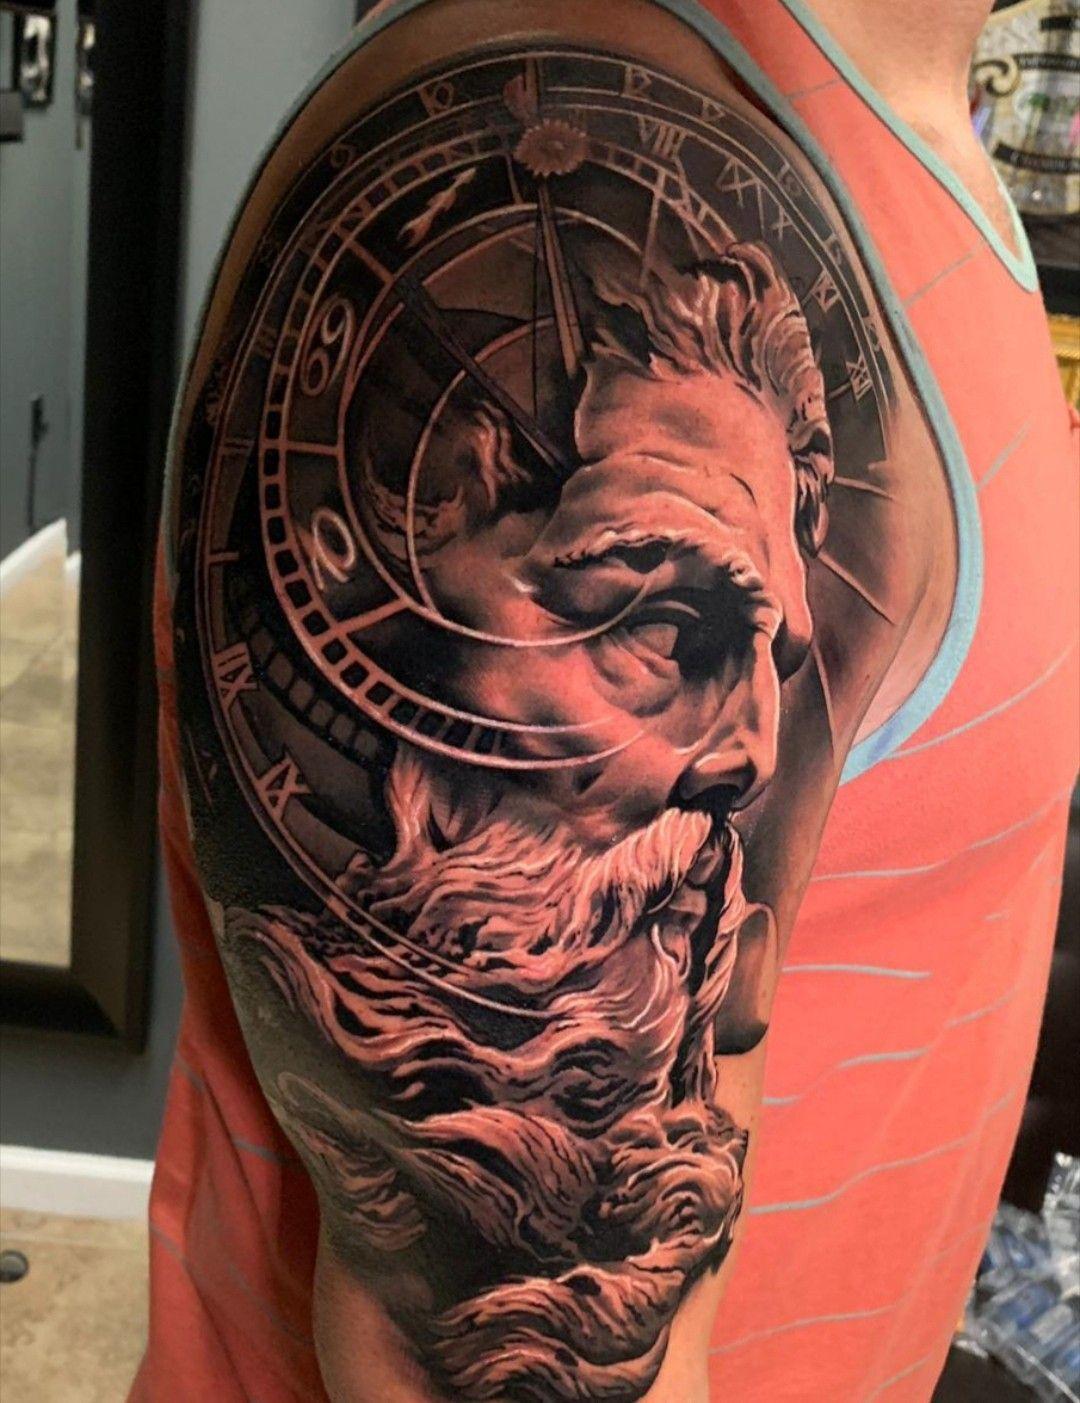 Superb Cronos Tattoo Cronos In Tattoos Poseidon Tattoo